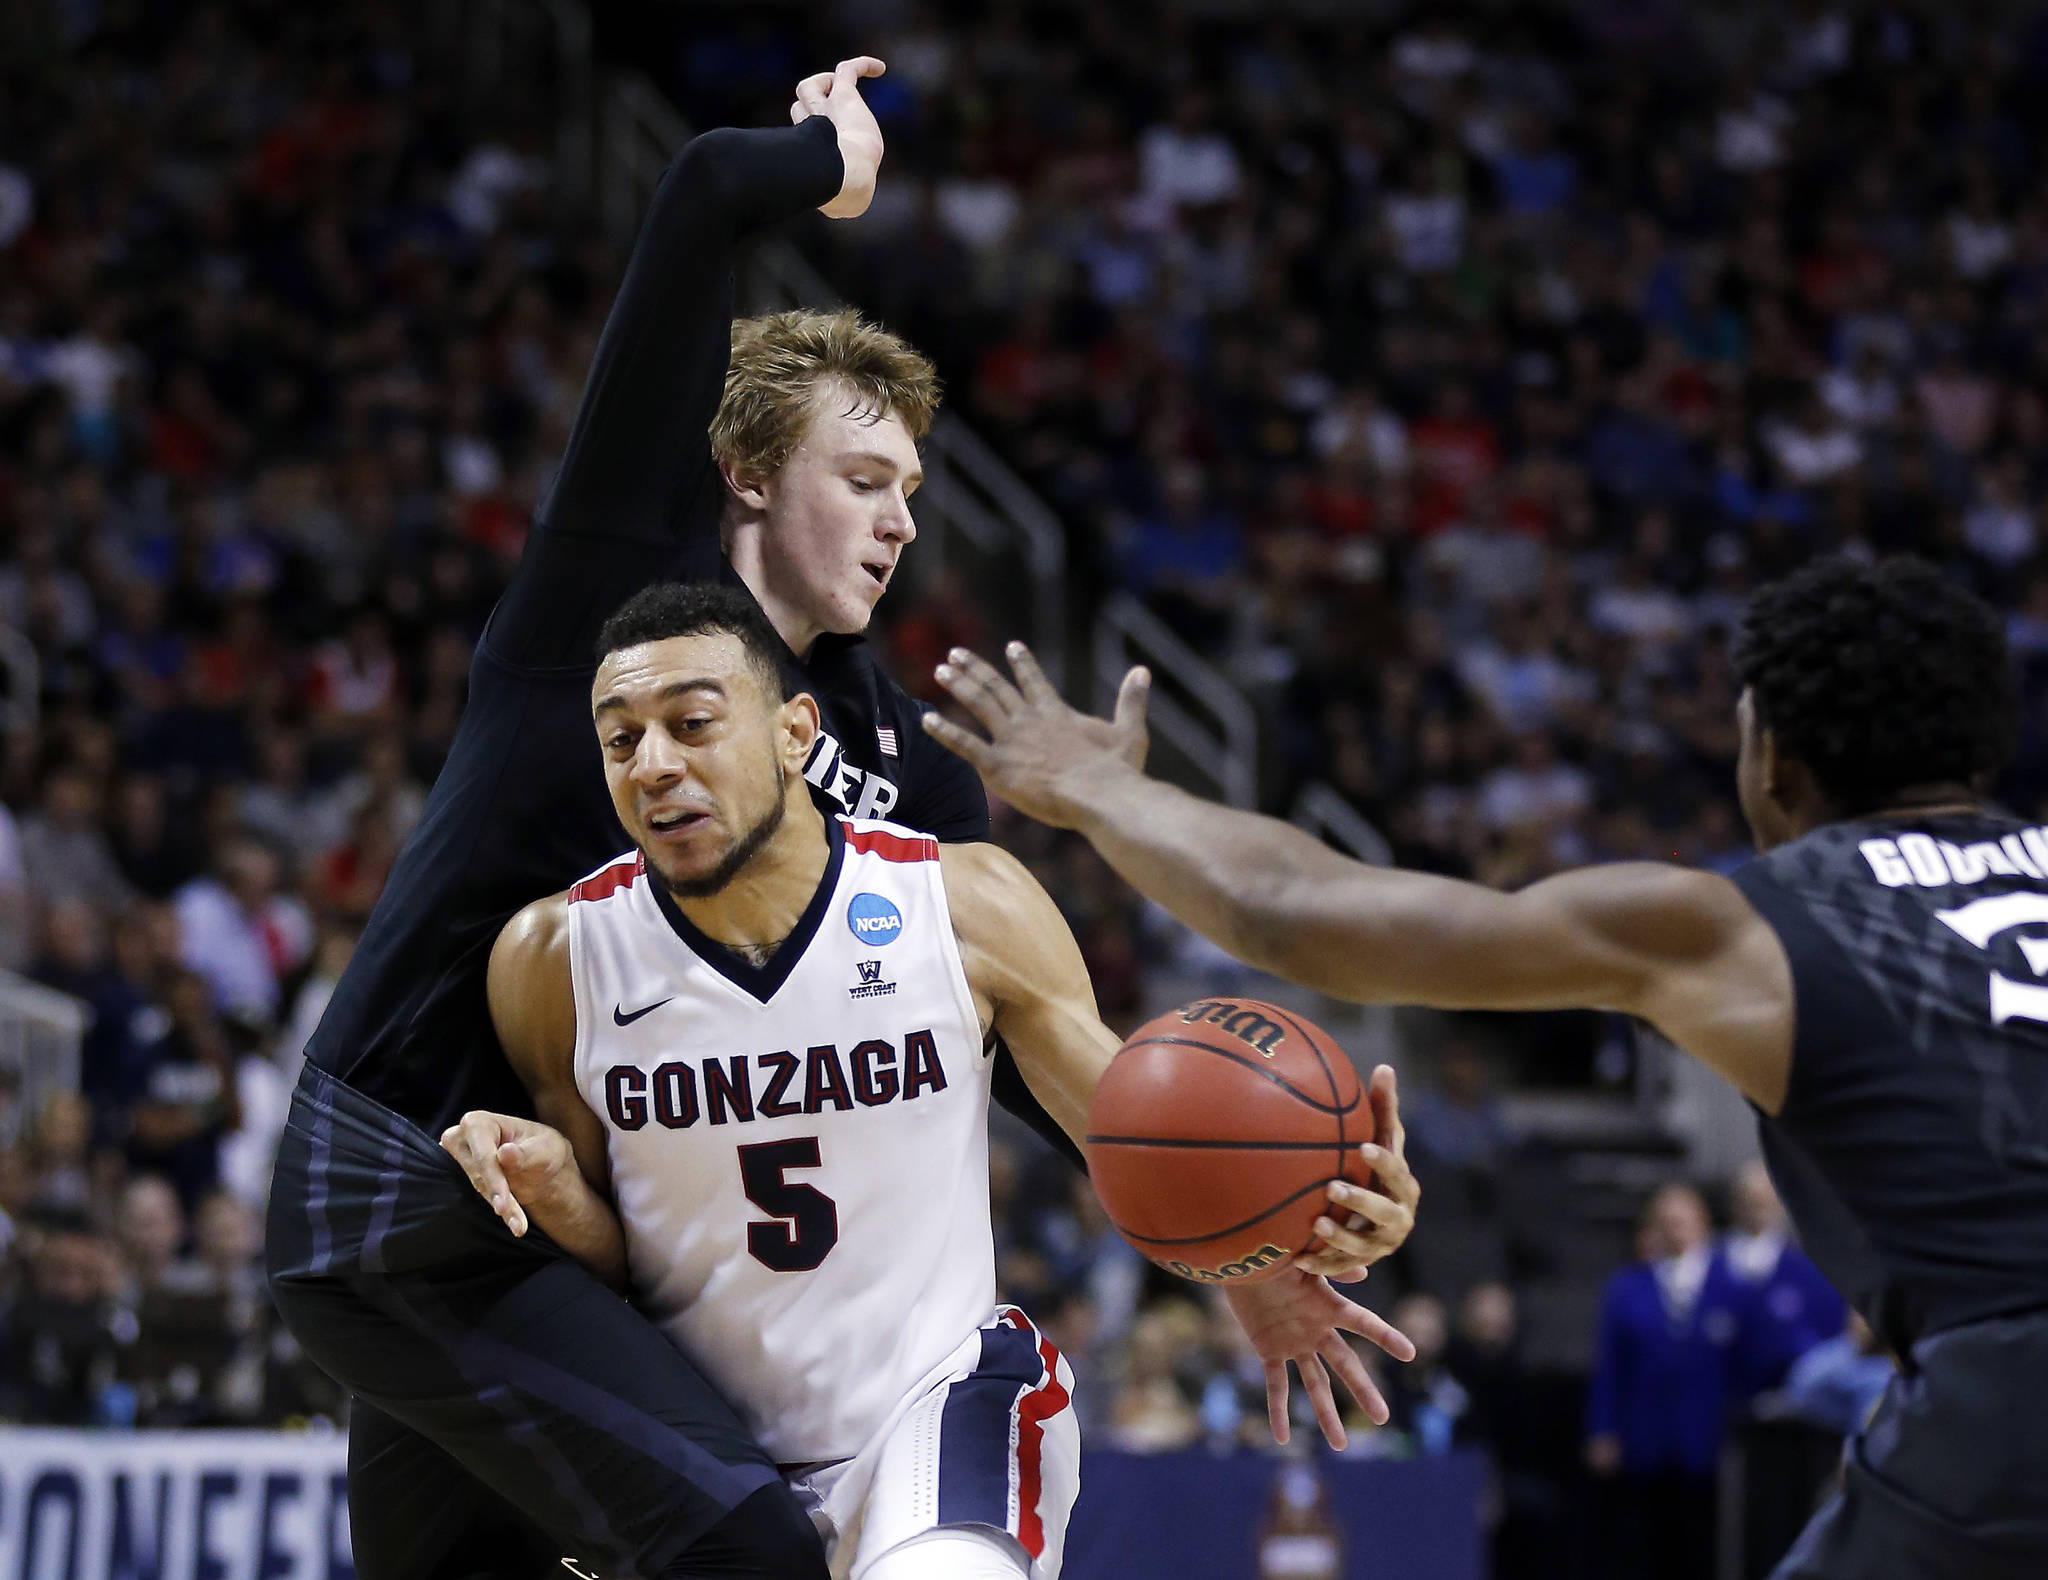 Basketball: Gonzaga into US college final